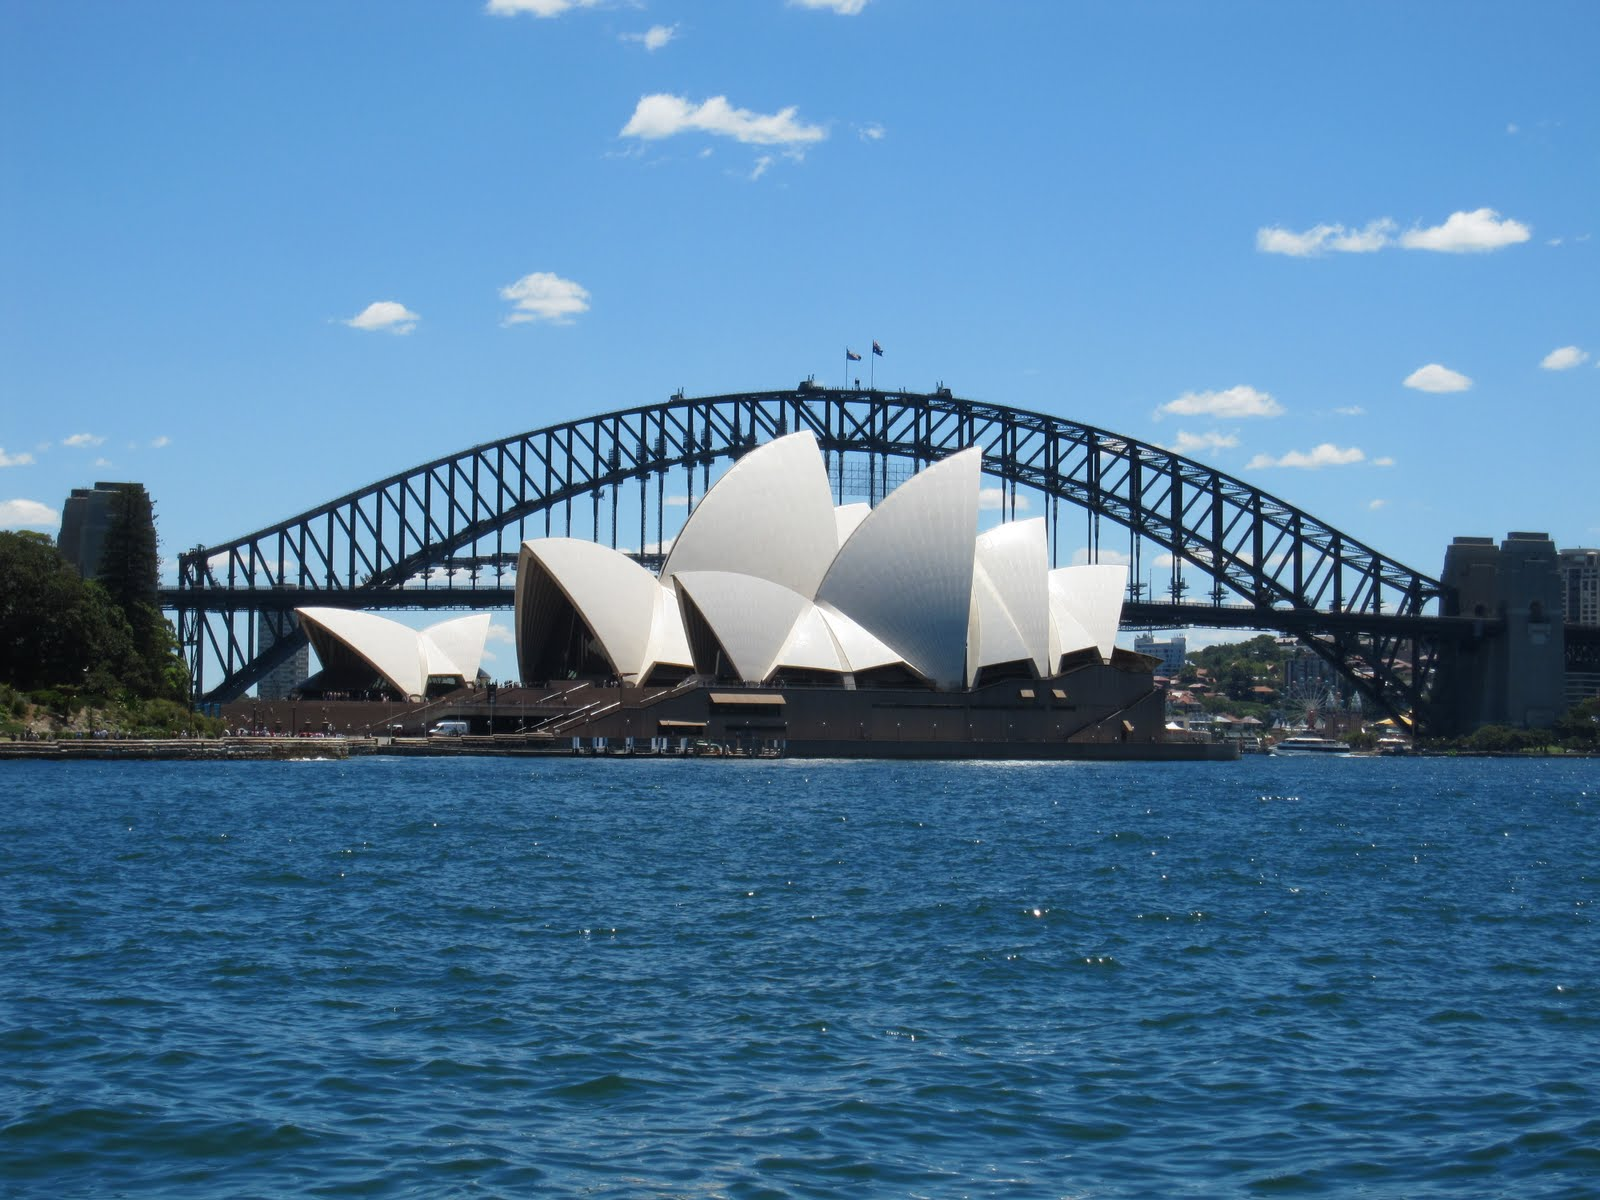 Opera+House+and+Harbour+Bridge+1 - View Sydney Harbour Bridge And Opera House Pictures  PNG